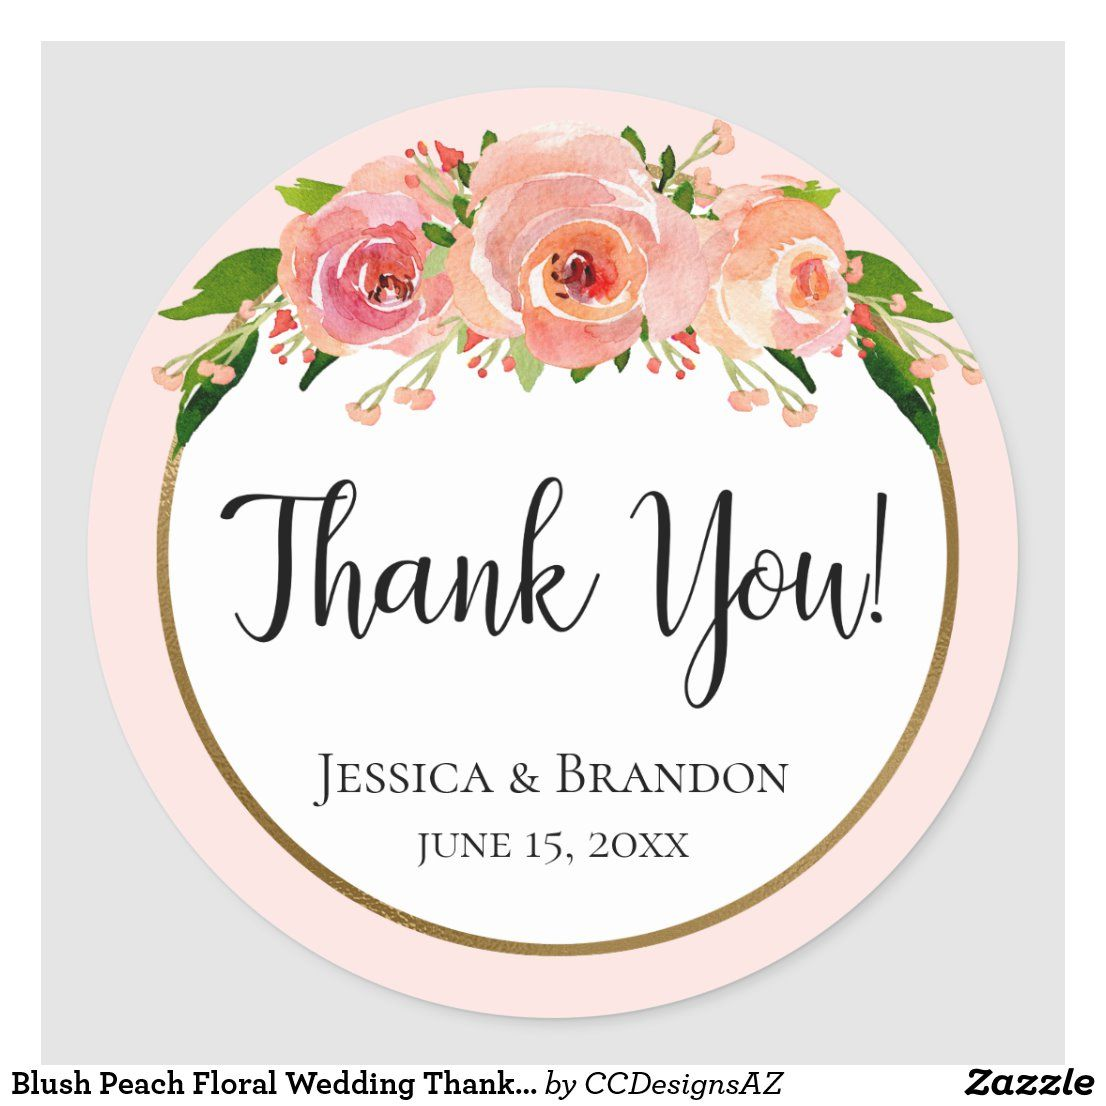 Blush Peach Floral Wedding Thank You Sticker In 2020 Wedding Stickers Labels Wedding Stickers Thank You Stickers